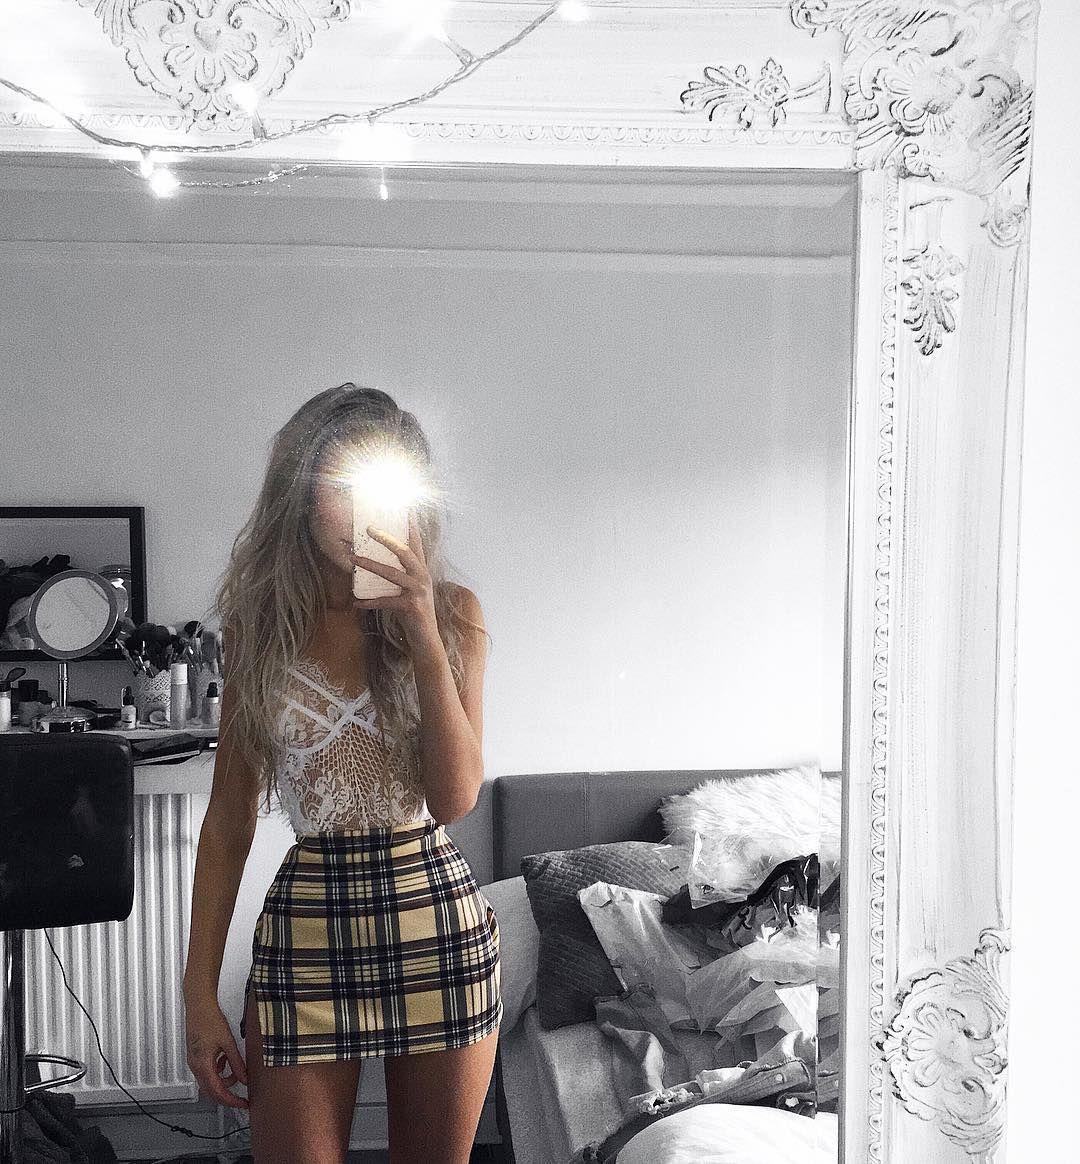 kjolen flicka janssen under